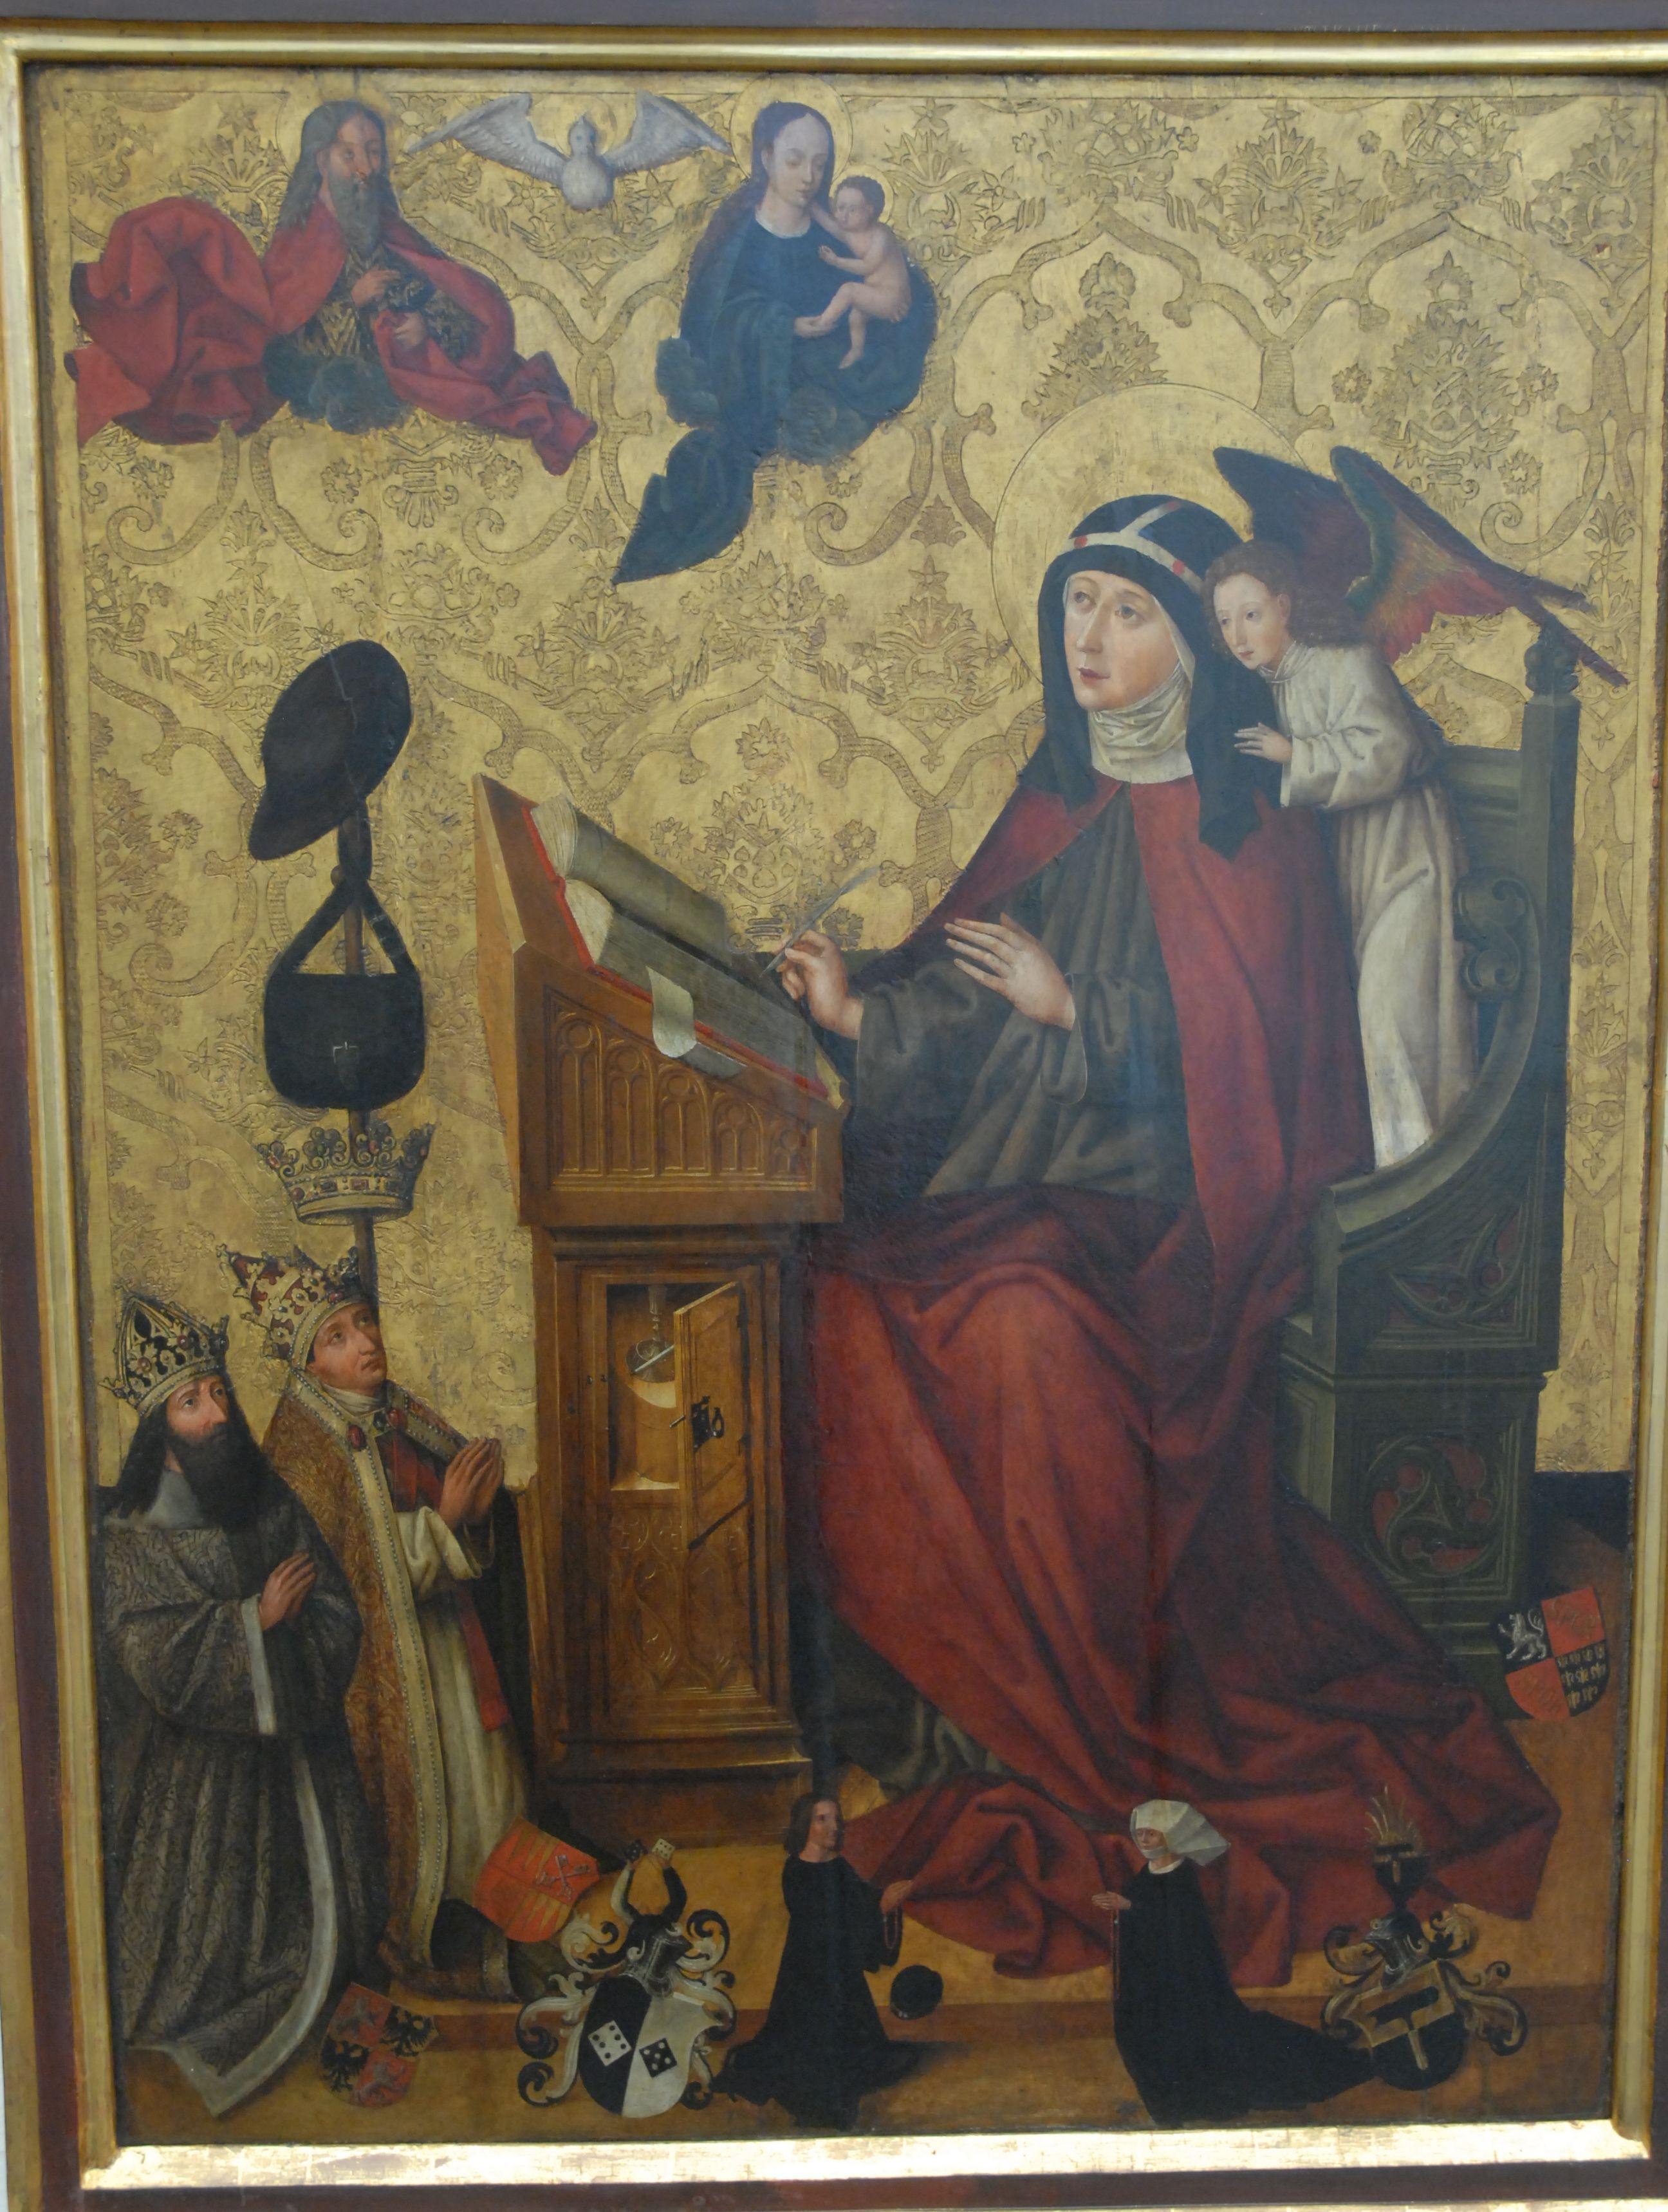 Heliga Birgitta, St. Bridget, Santa Brígida, Sainte Brigitte